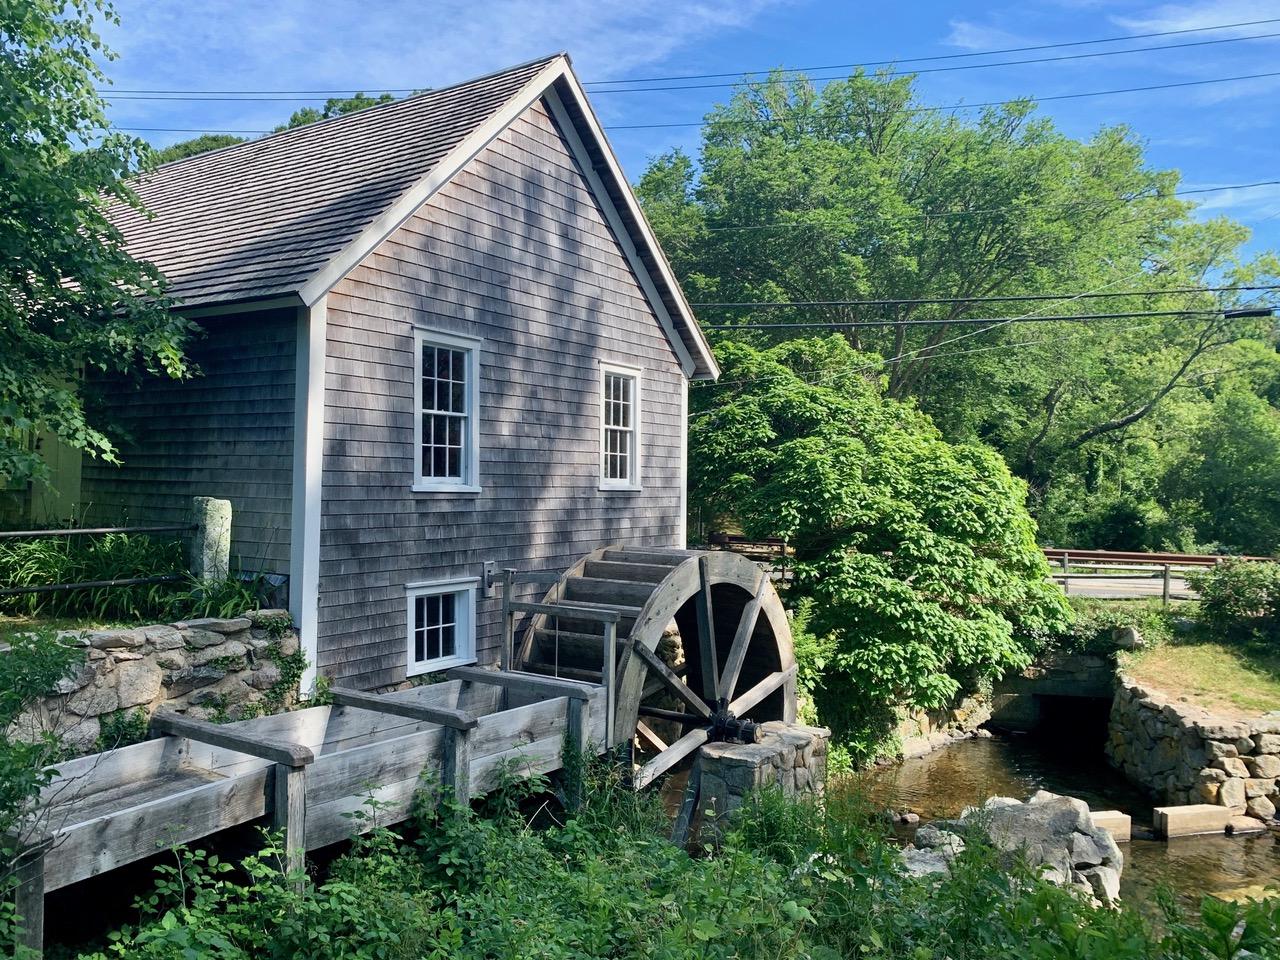 Stony Brook Grist Mill